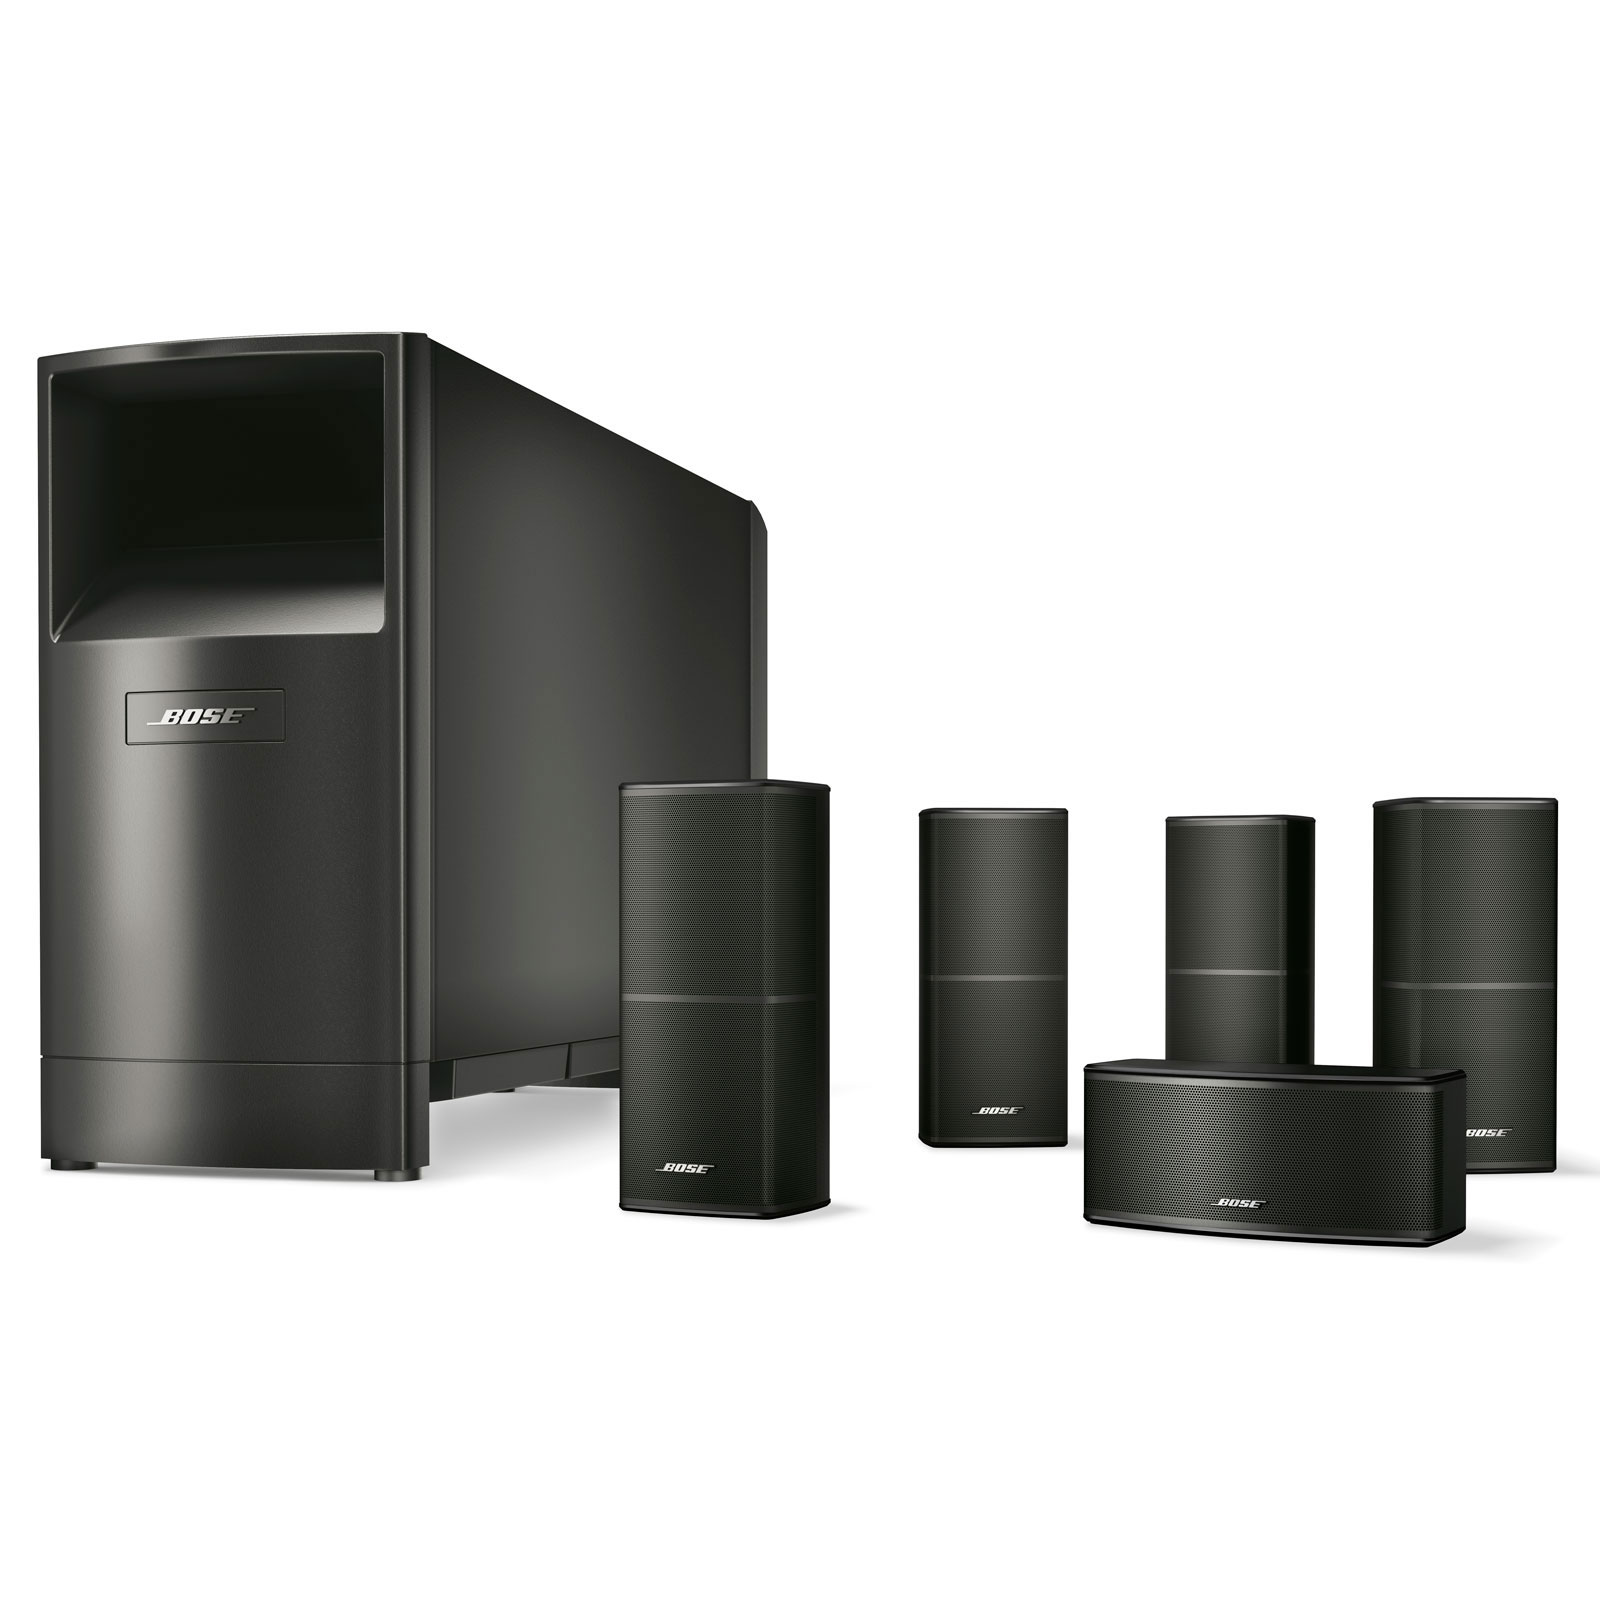 bose acoustimass 10 s ries v noir enceintes hifi bose. Black Bedroom Furniture Sets. Home Design Ideas